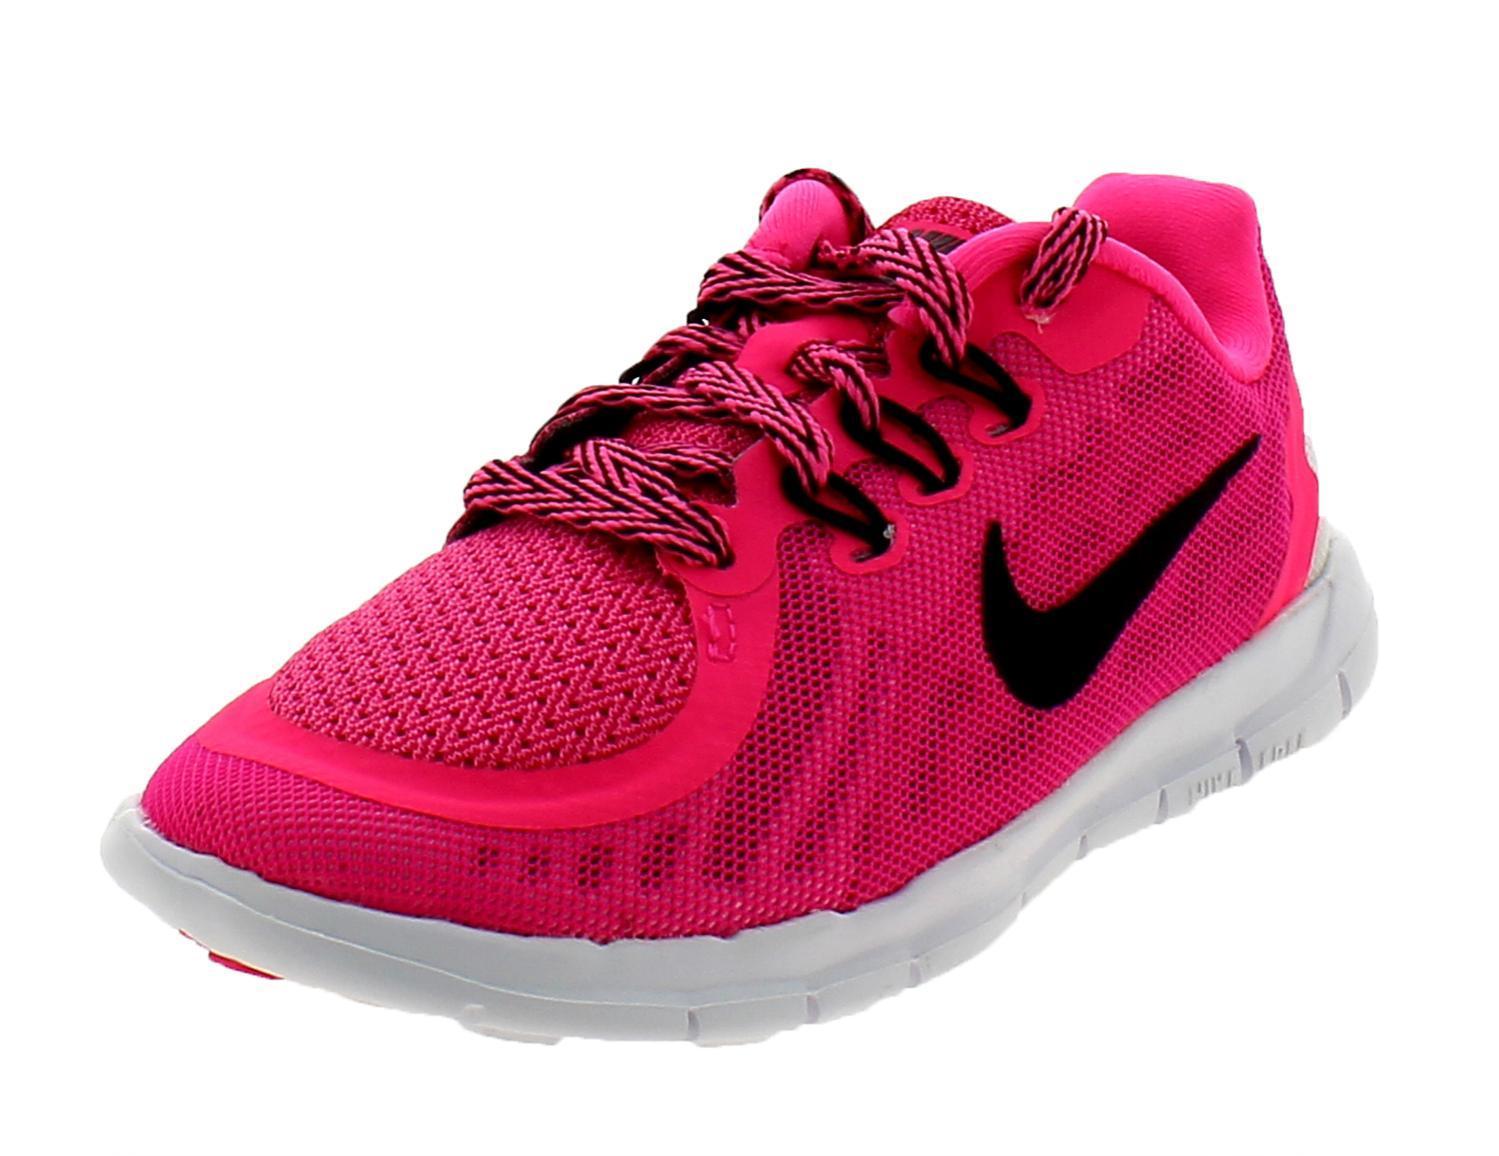 Nike Free 5   40 PS  41  Scarpe Sportive Bambina Rosa Tela 725115  8ef6d78348a